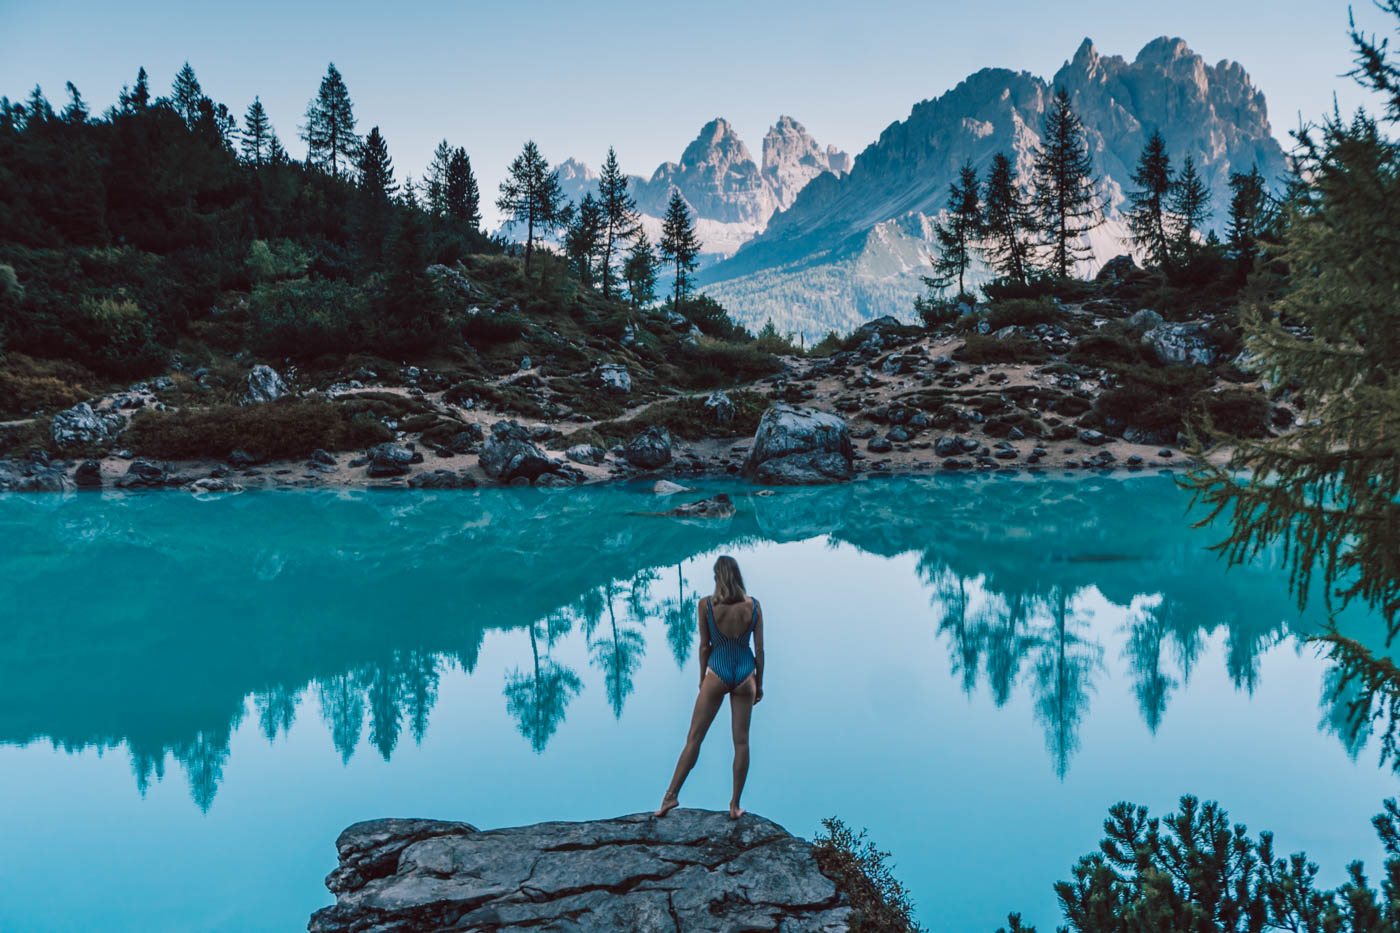 Wanderung zum Lago di Sorapiss,